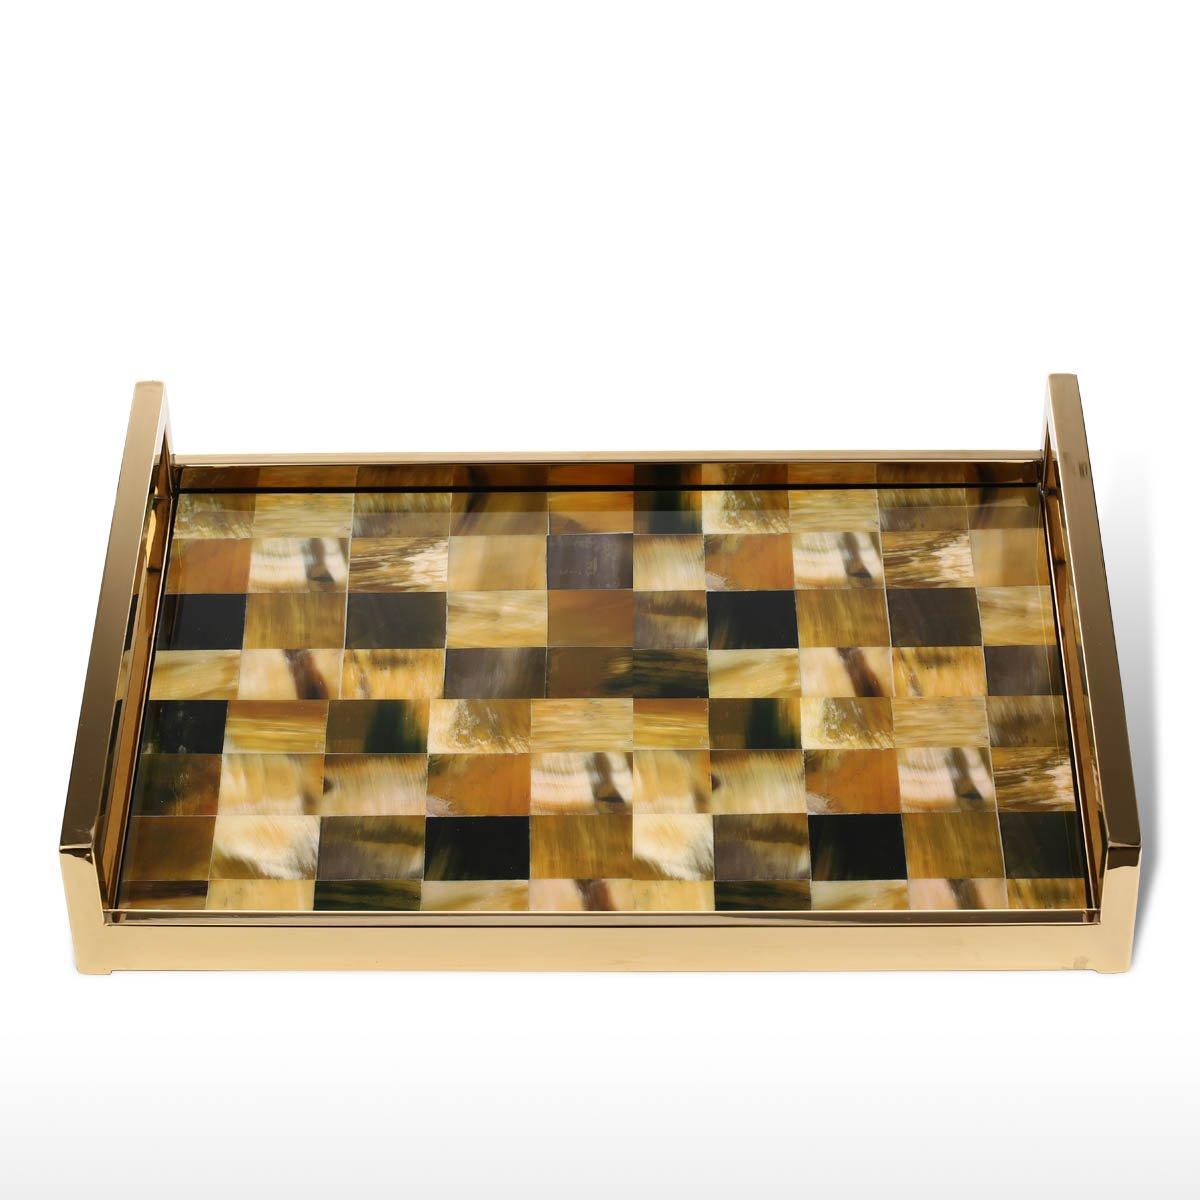 Tooarts Rectangular Tray with Horn Stripes(Large Size) Wooden Piano Baking Varnish Technology Tea Tray Fruit Tray Coffee Tray Home Decor